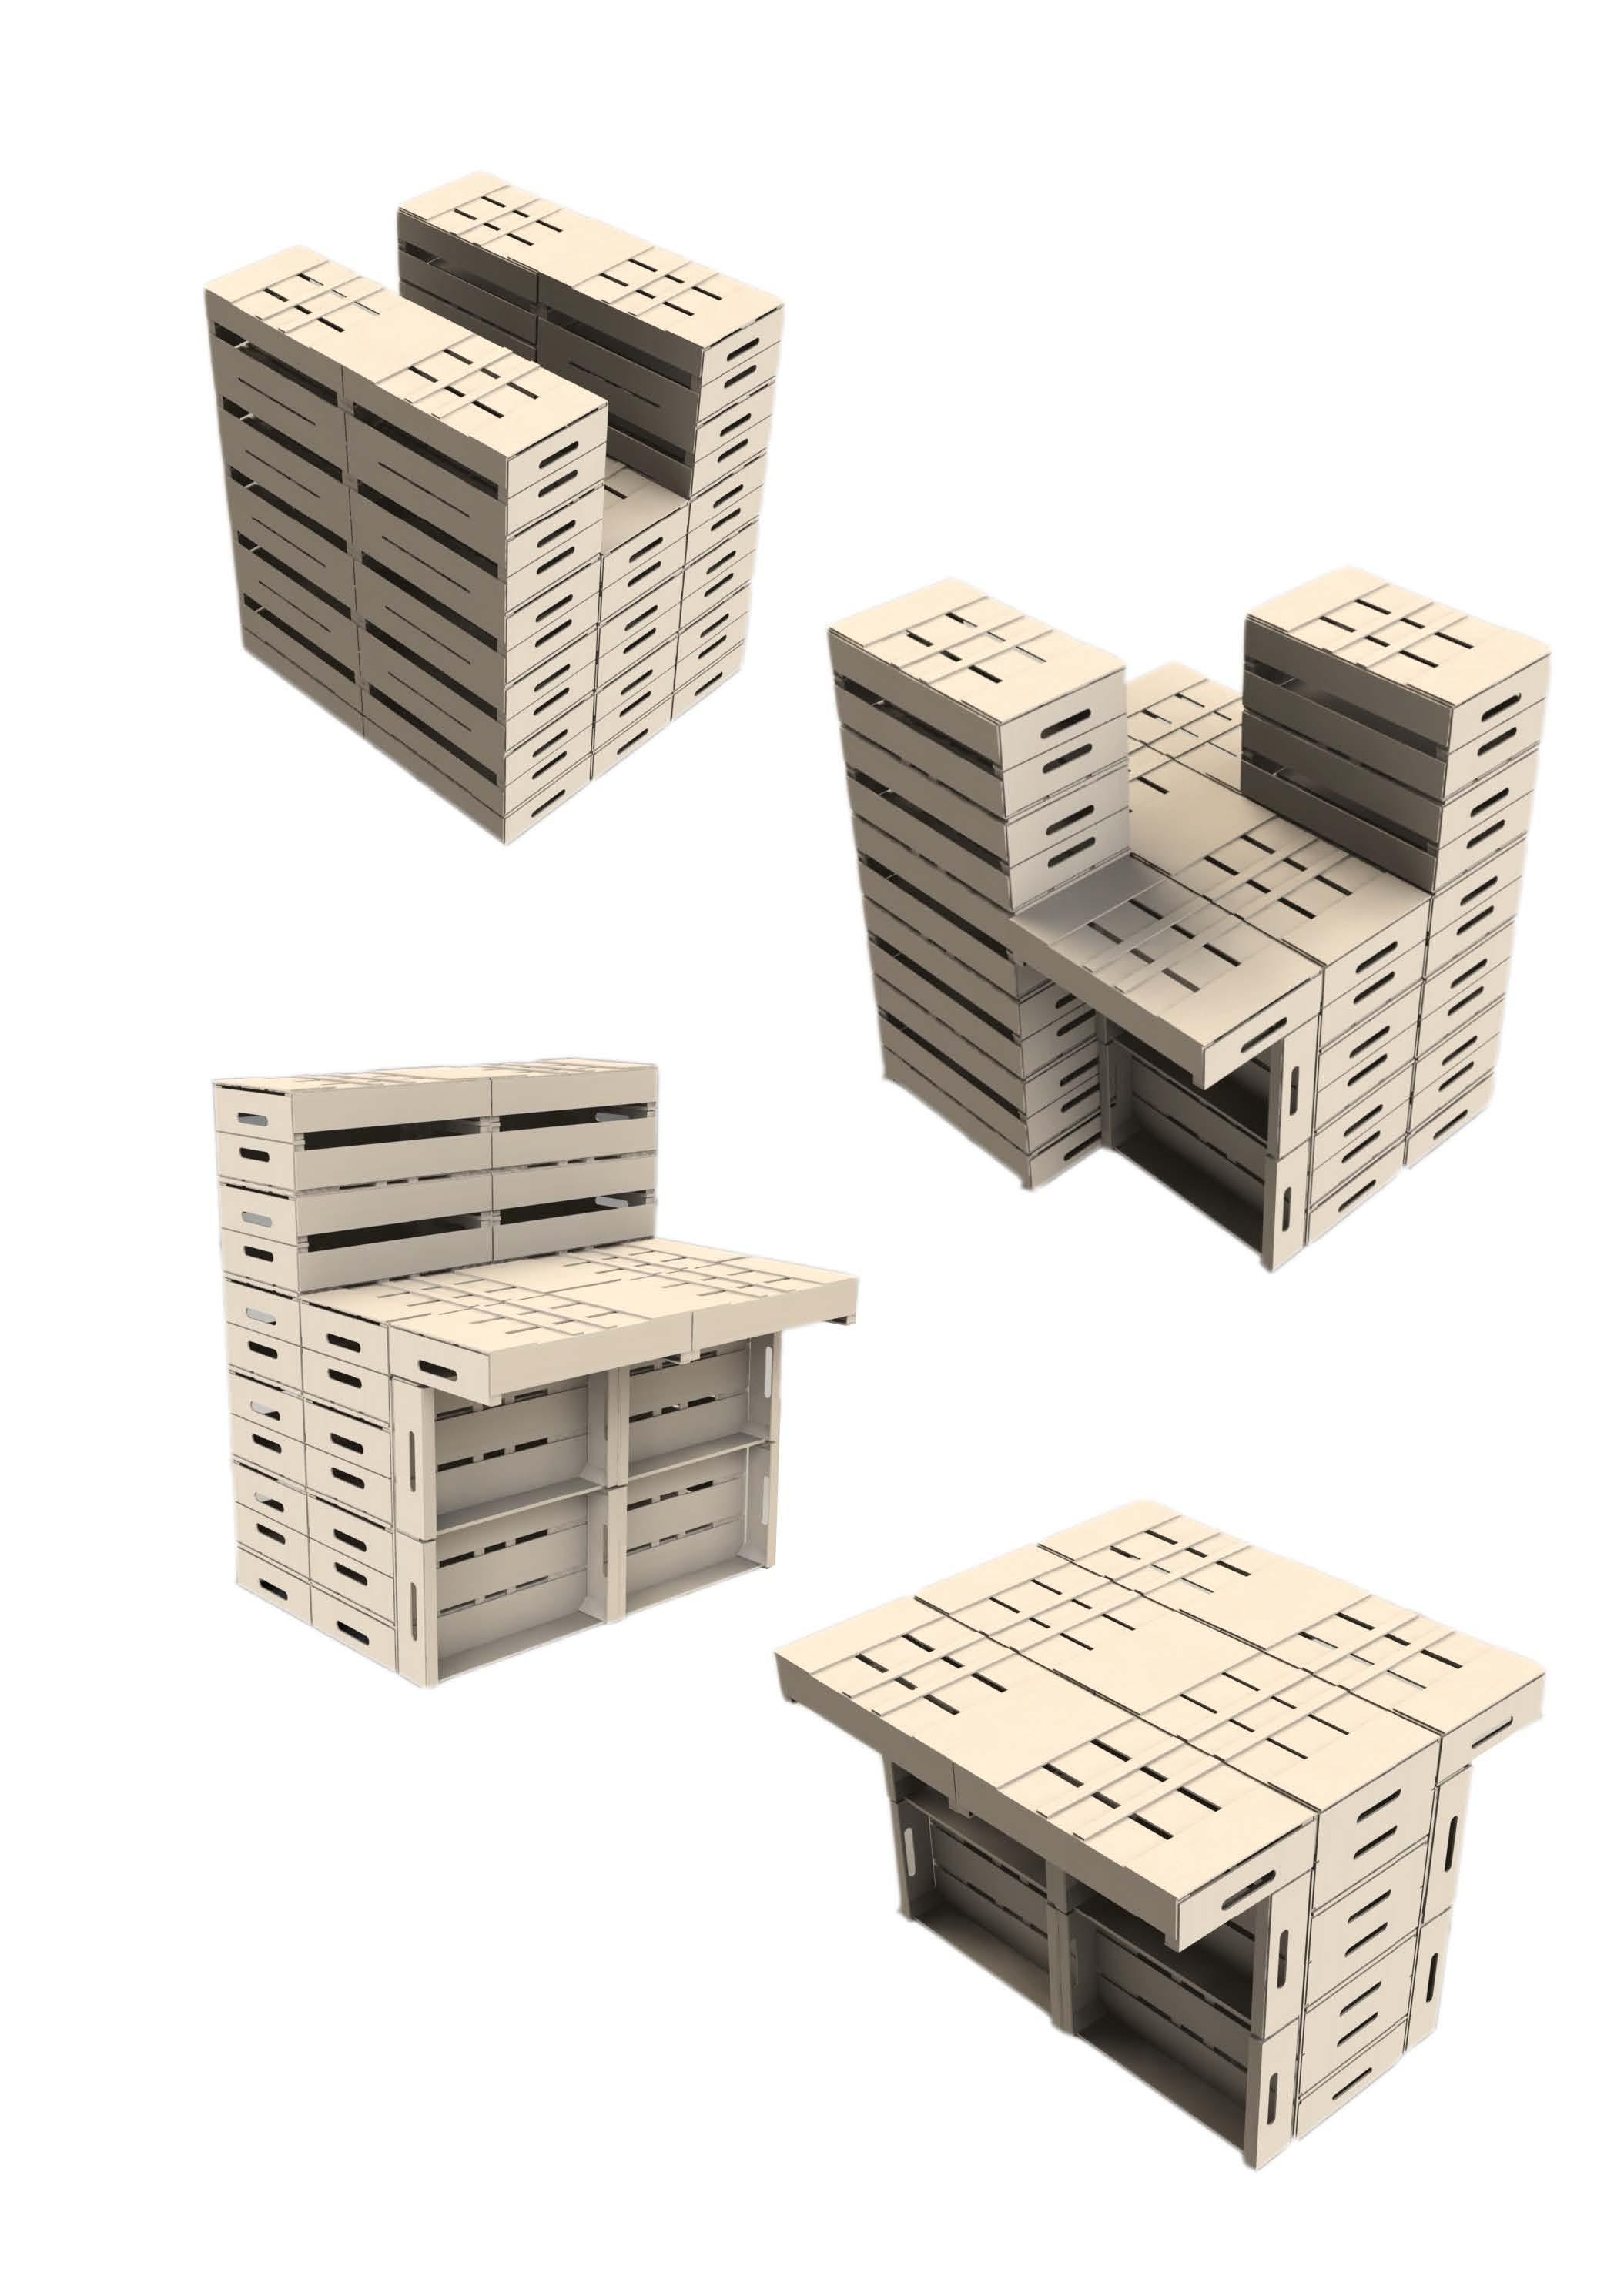 4 modules